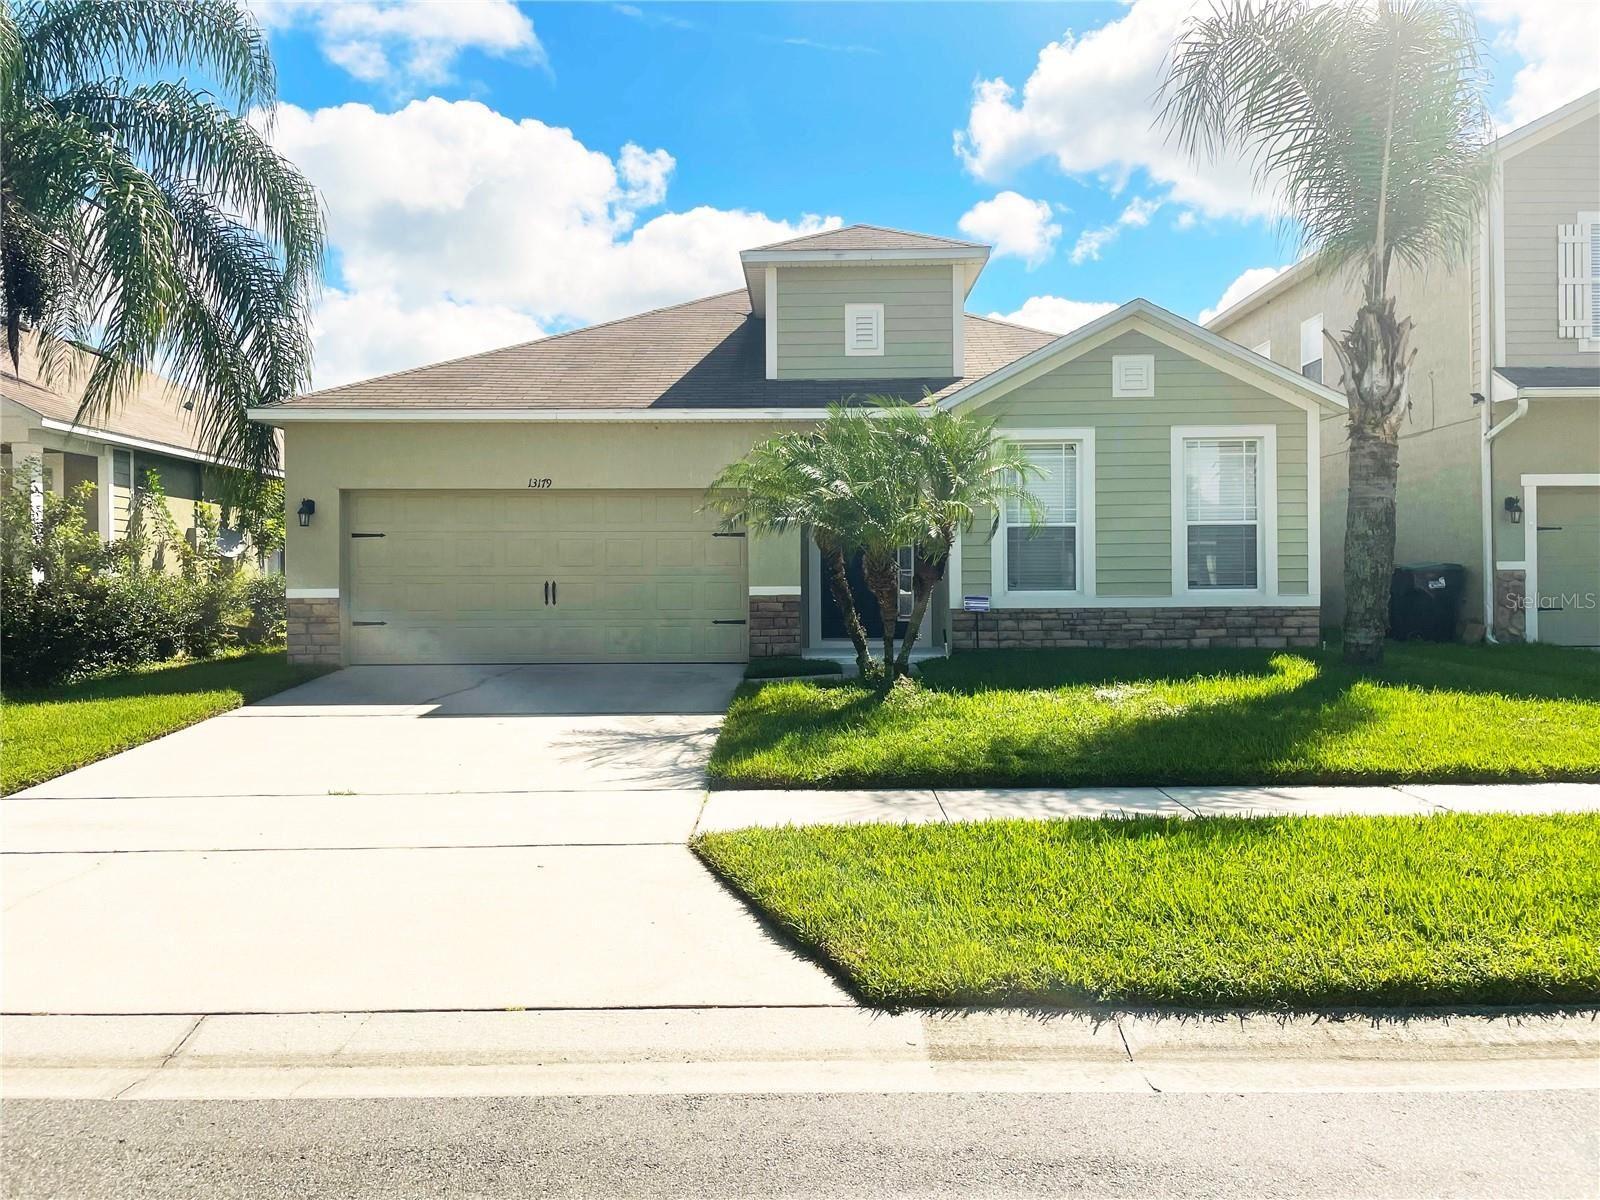 13179 SAPPHIRE FALLS LANE, Orlando, FL 32824 - #: S5056820